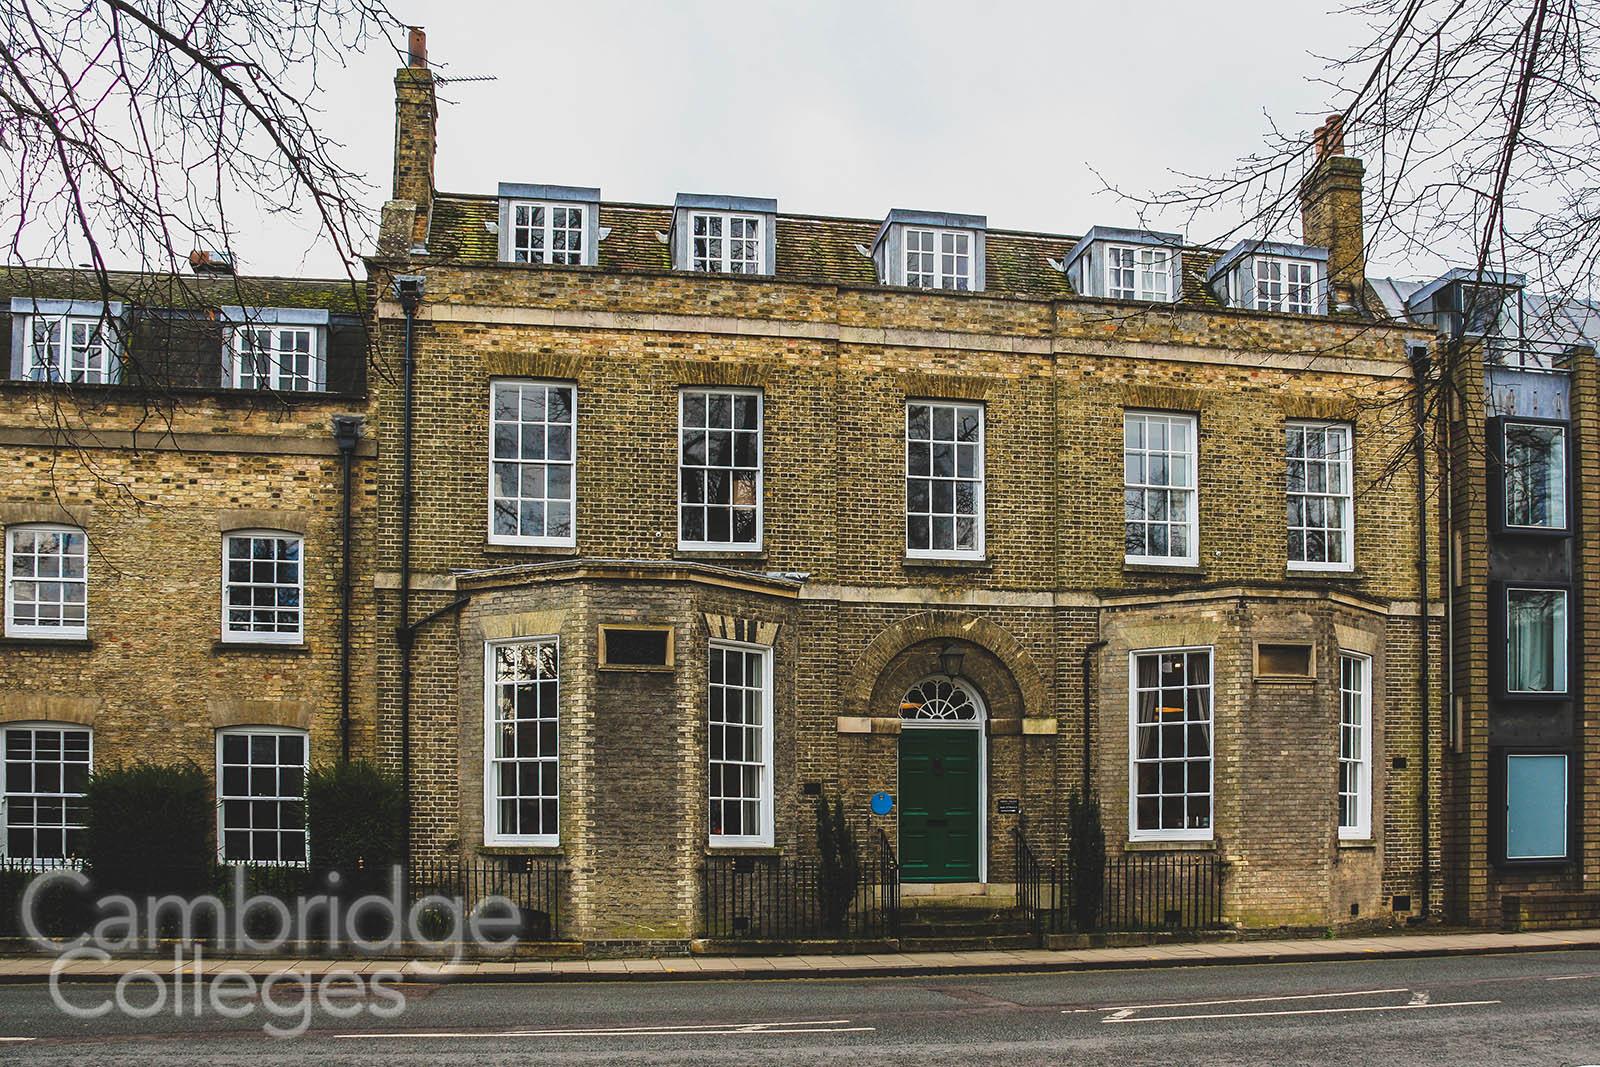 Darwin college's Newnham Grange on Silver Street